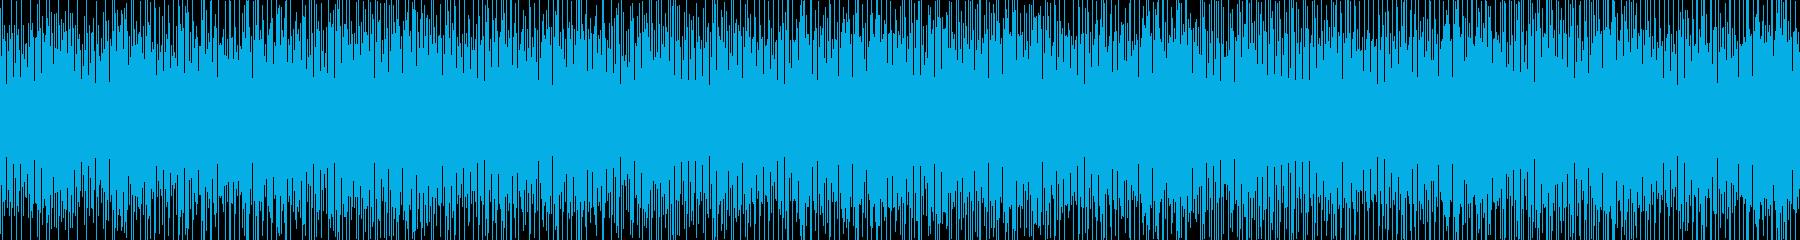 A fun, laid-back, bright pop loop's reproduced waveform